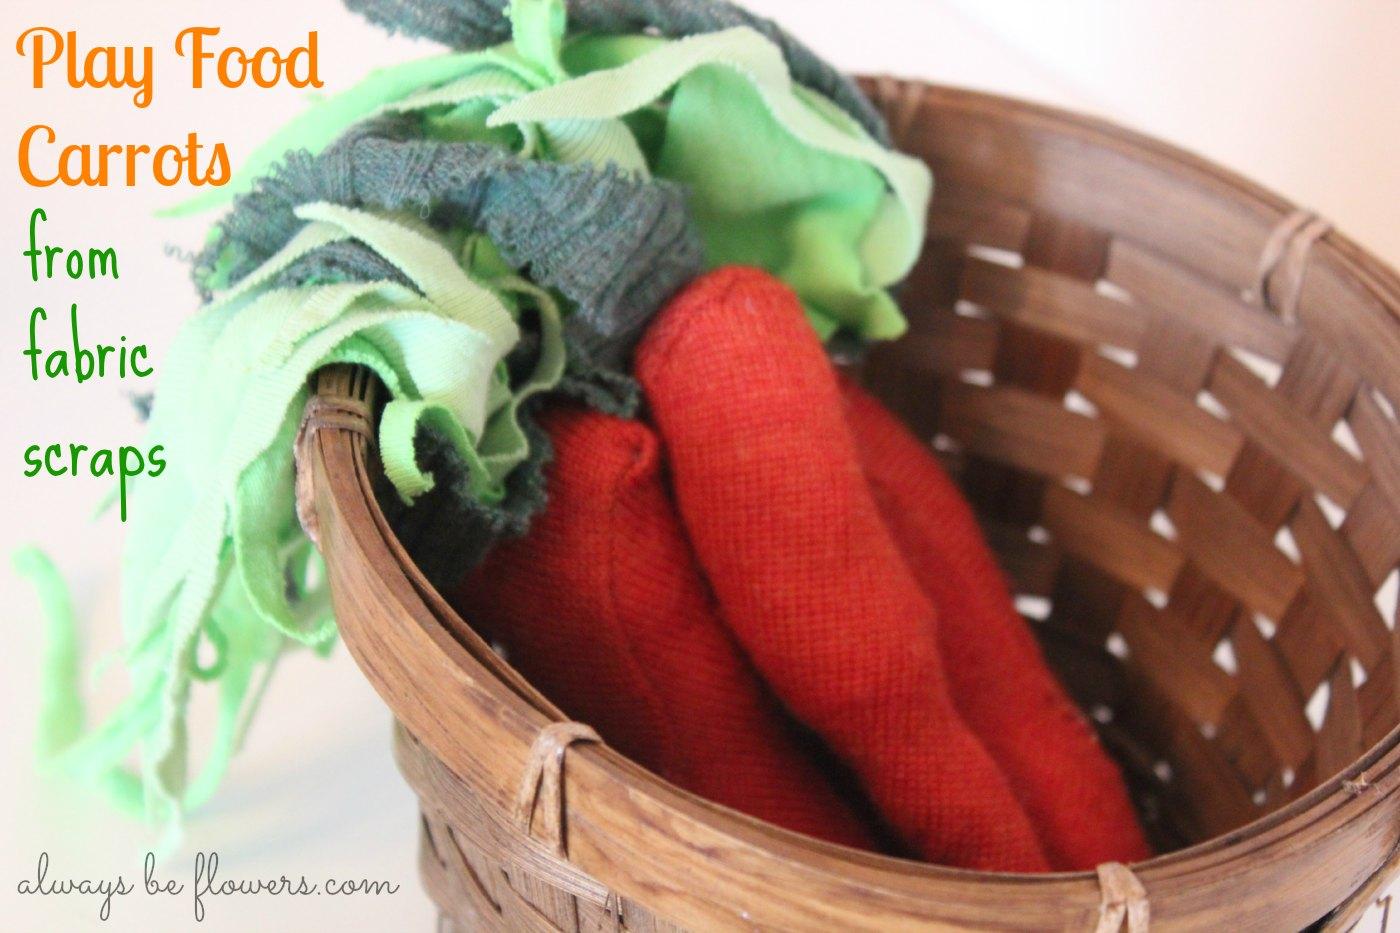 play-food-carrots-fabric-scraps.jpg